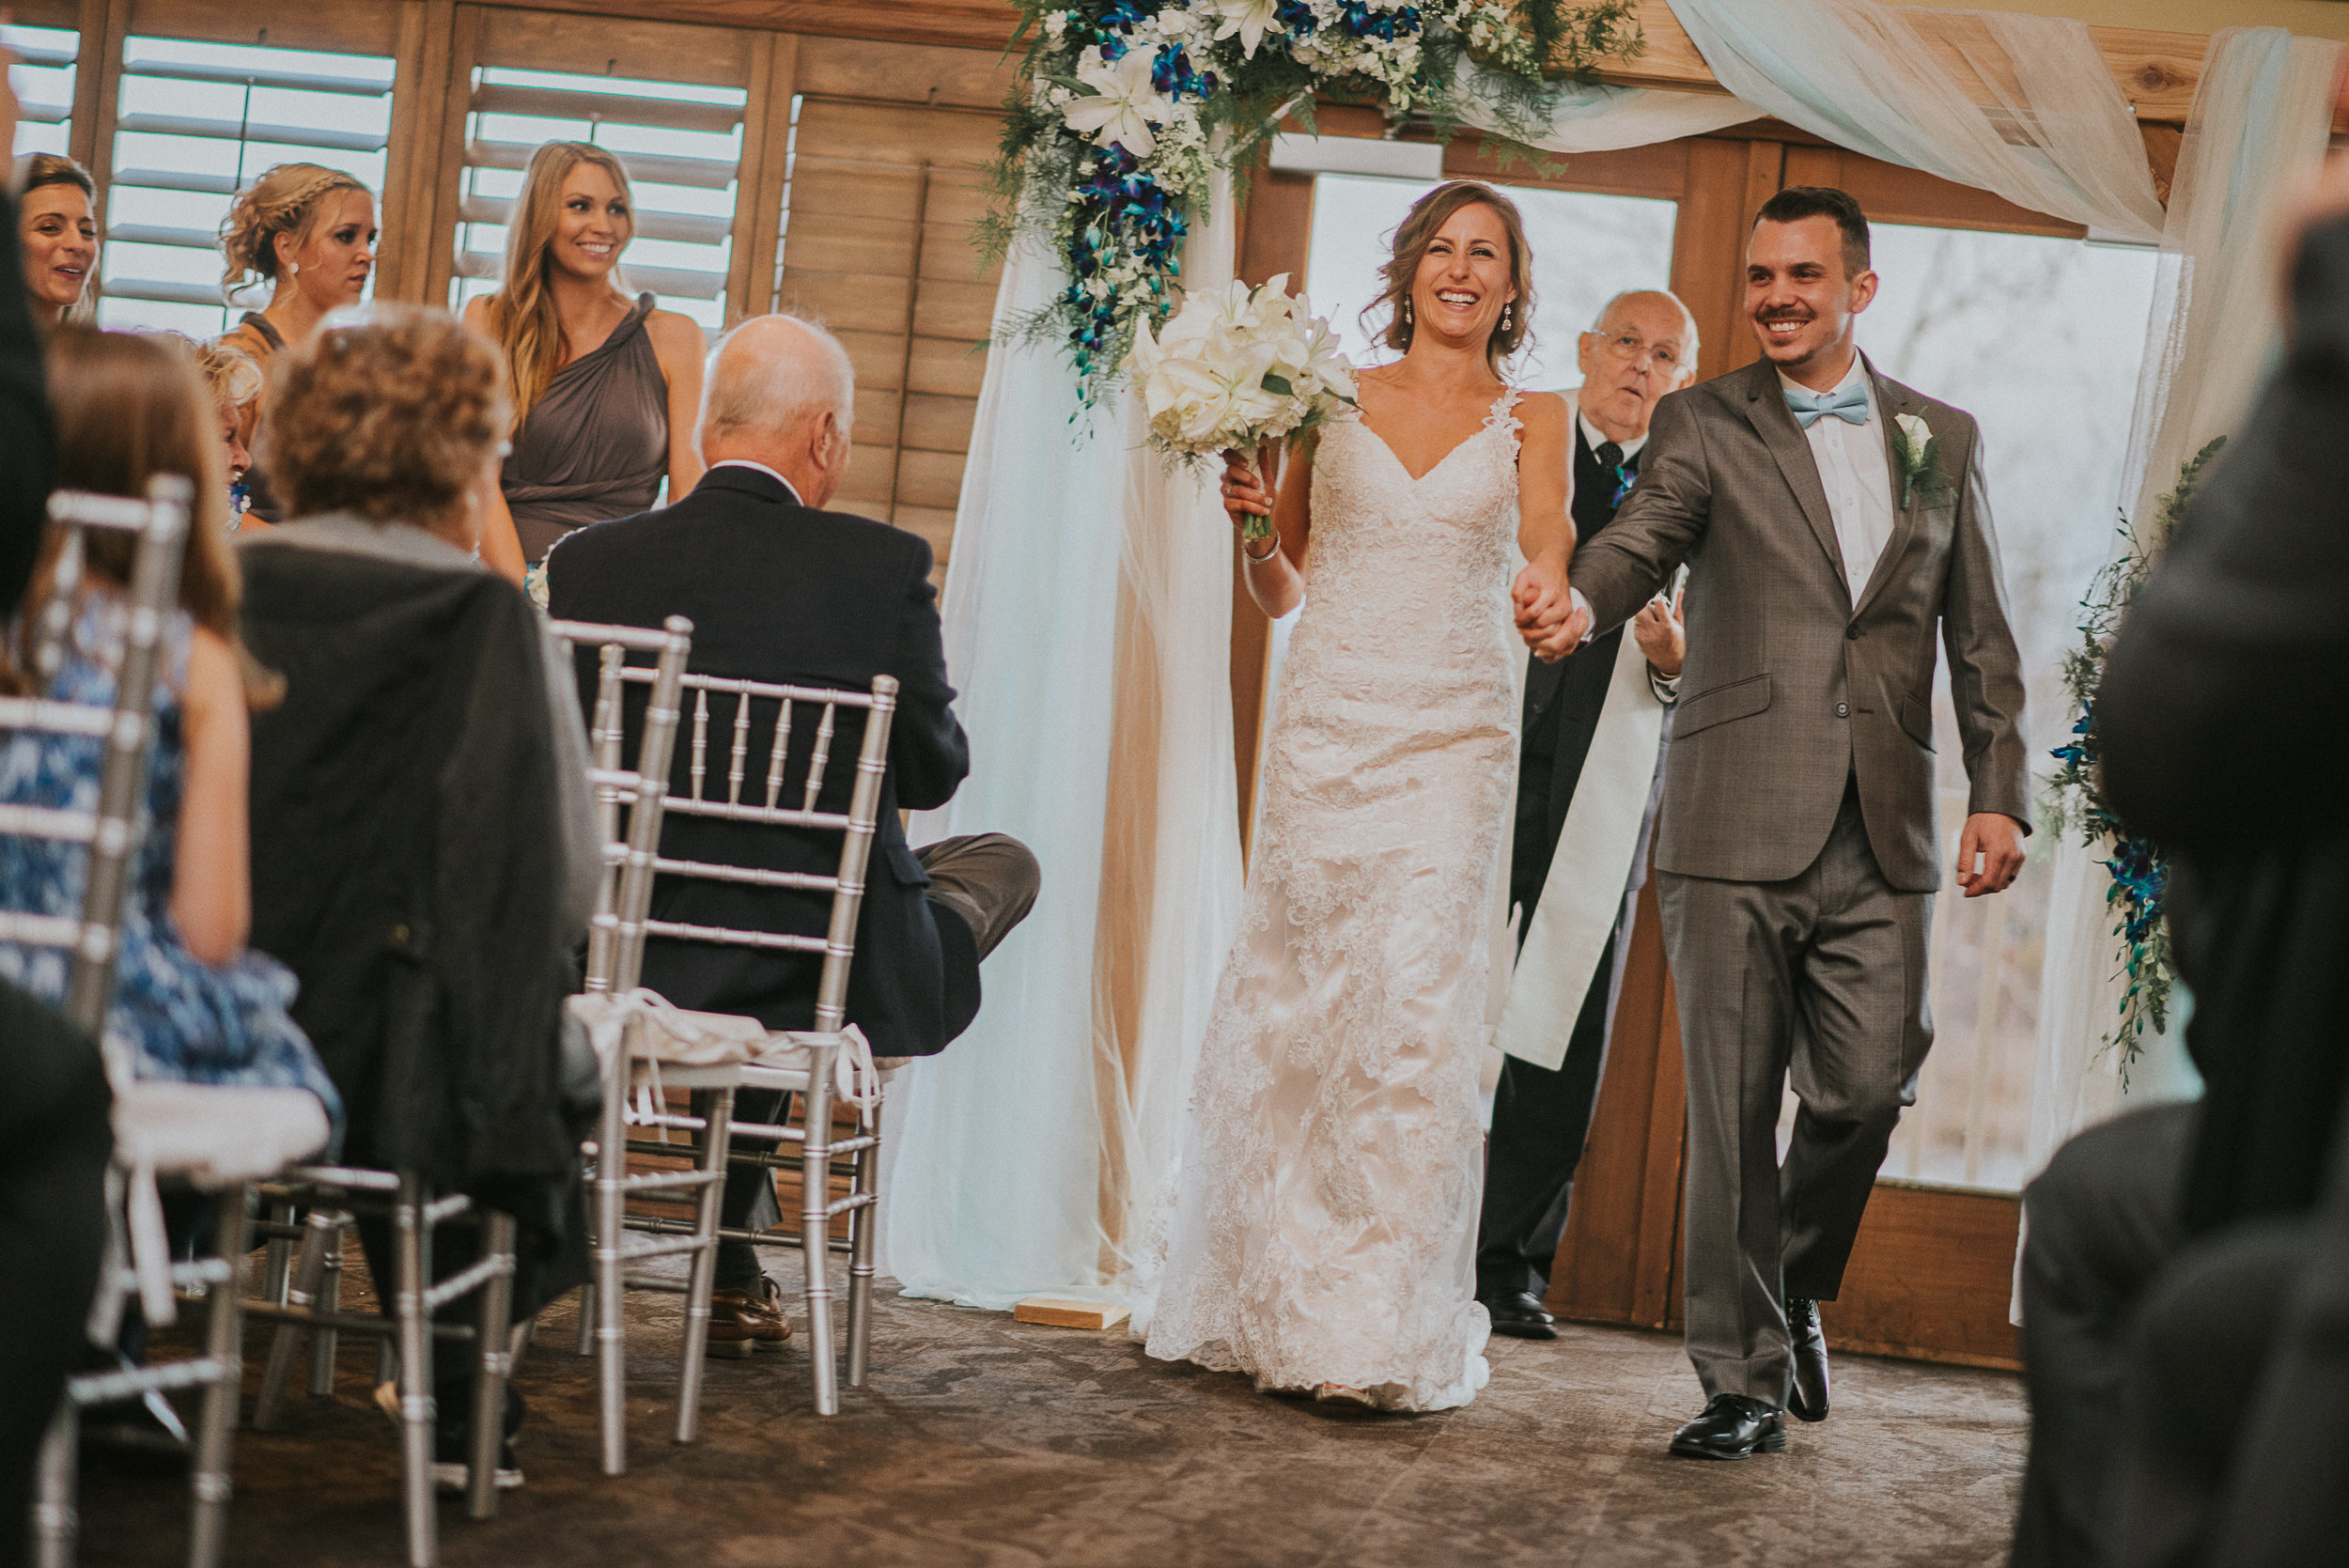 Camden-Boat-House-Wedding-Ali-and-Lance-248.jpg